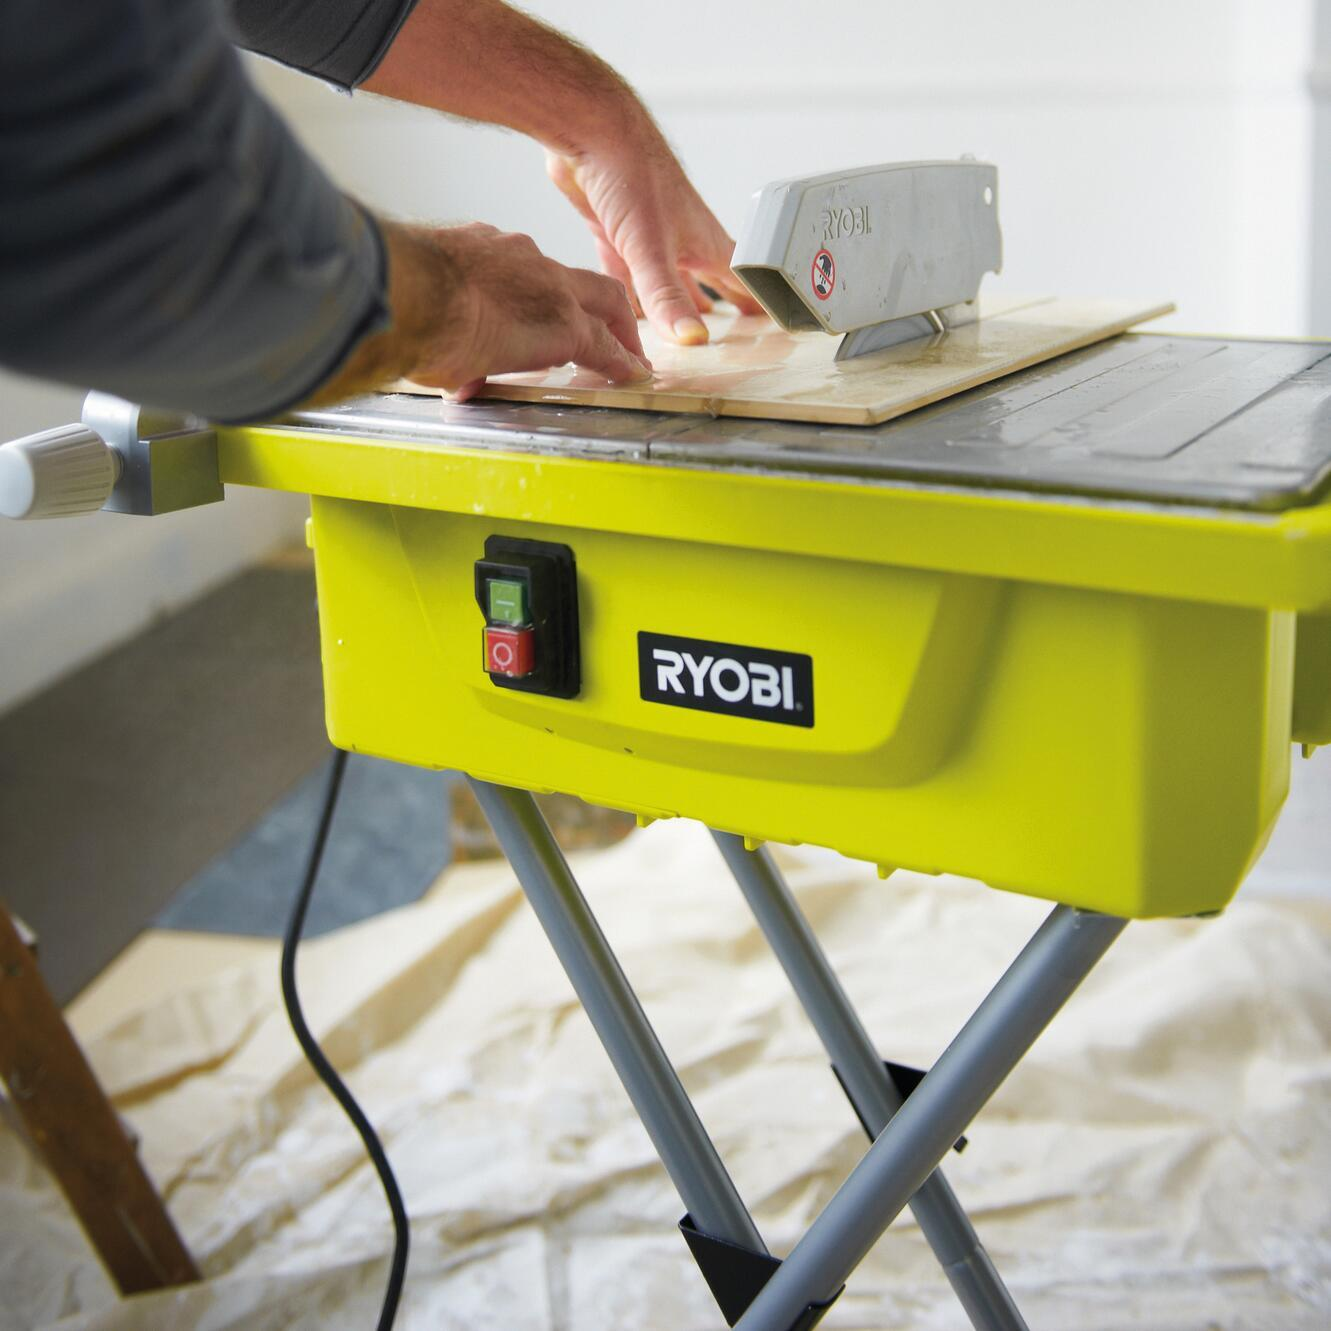 Tagliapiastrelle elettrica RYOBI Ø disco 178 mm, H taglio 33 mm, 500 W - 4